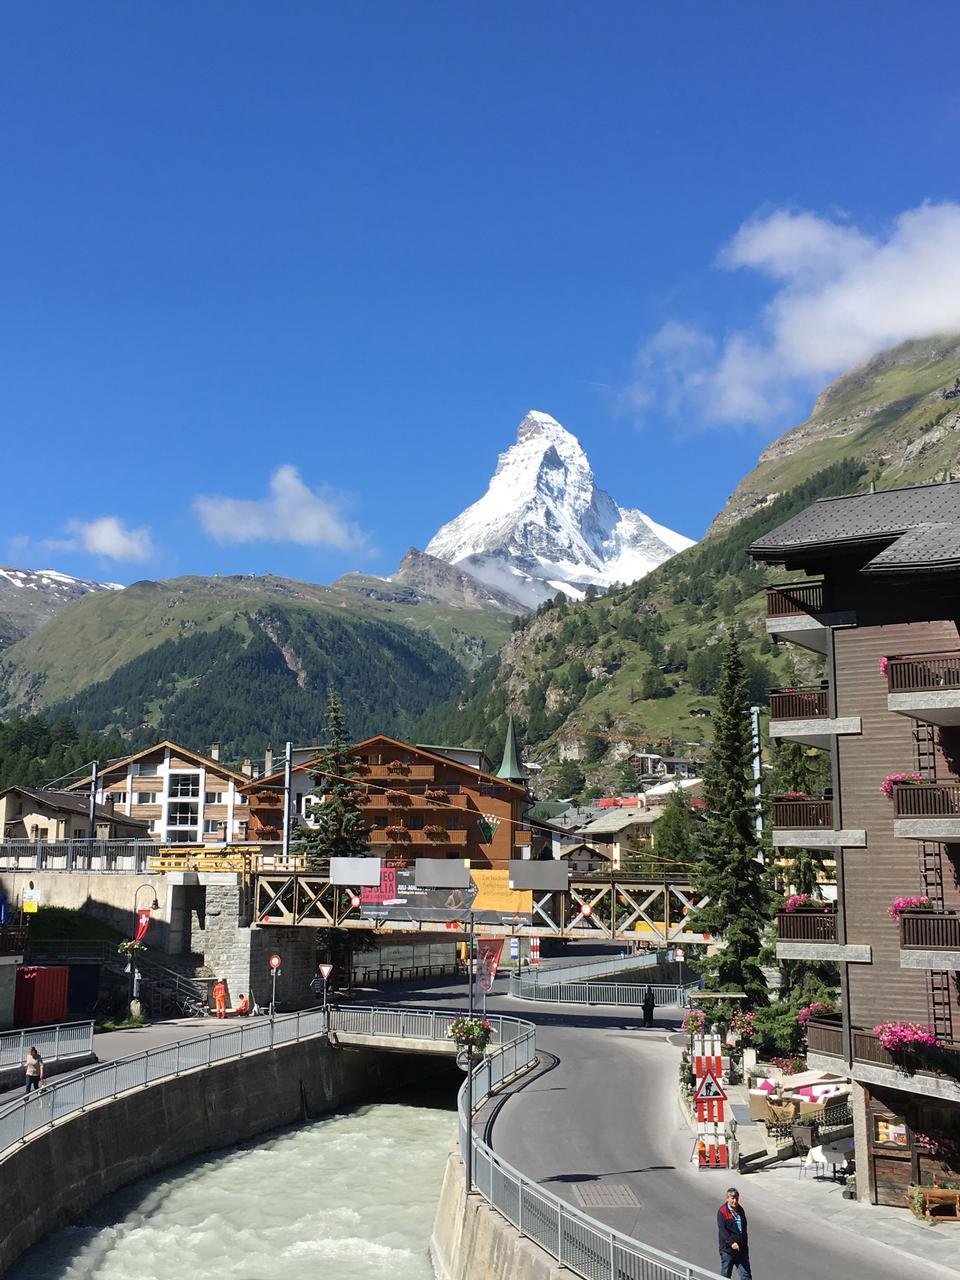 Chamonix-Mont-Blanc village